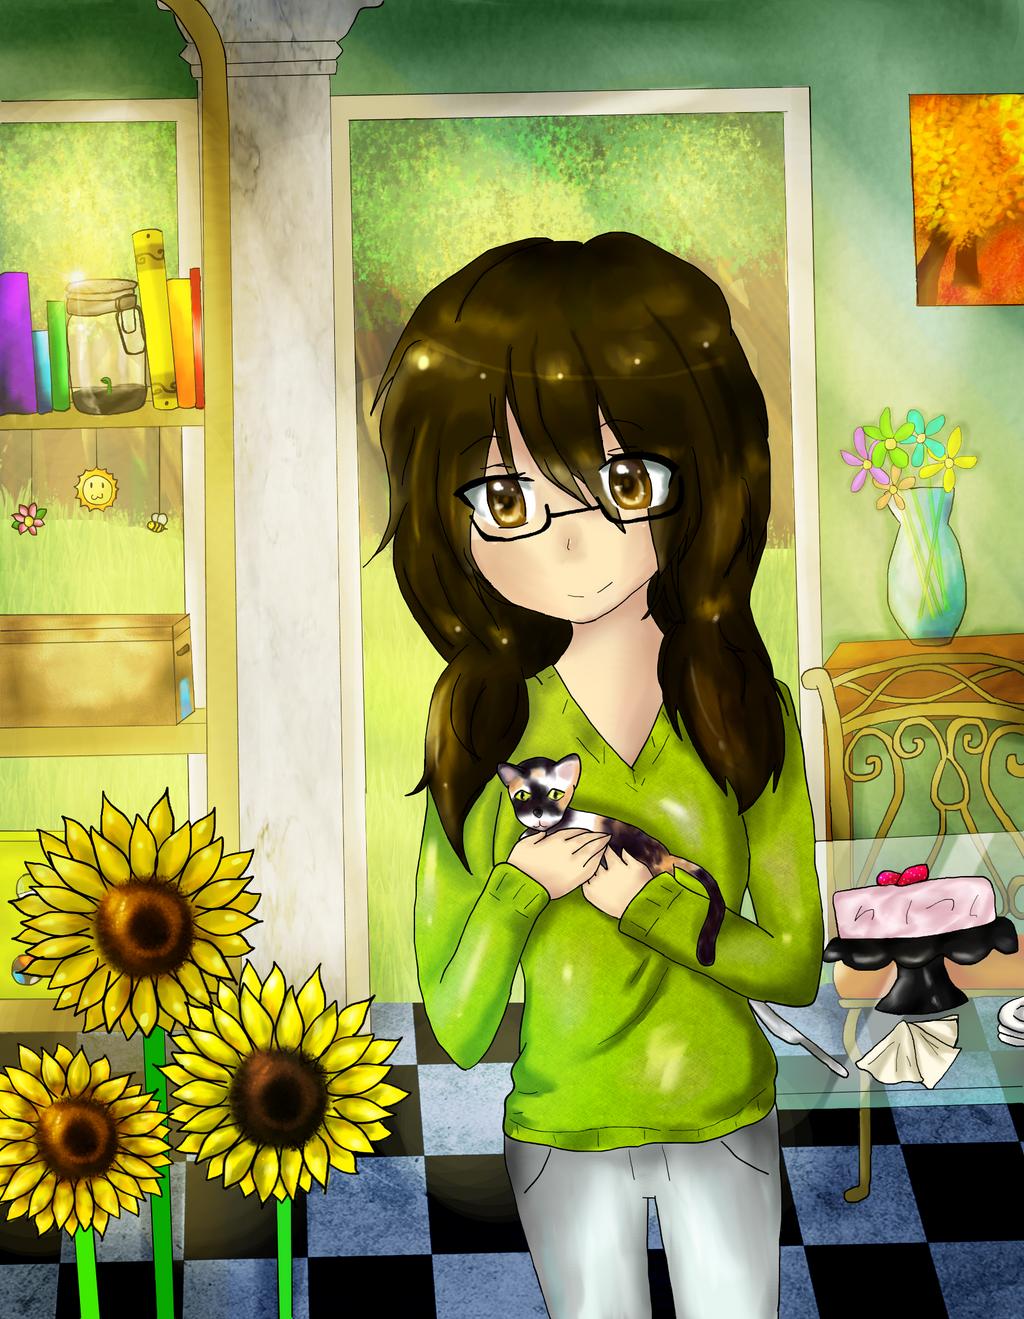 AkiraHoshi-chan's Profile Picture